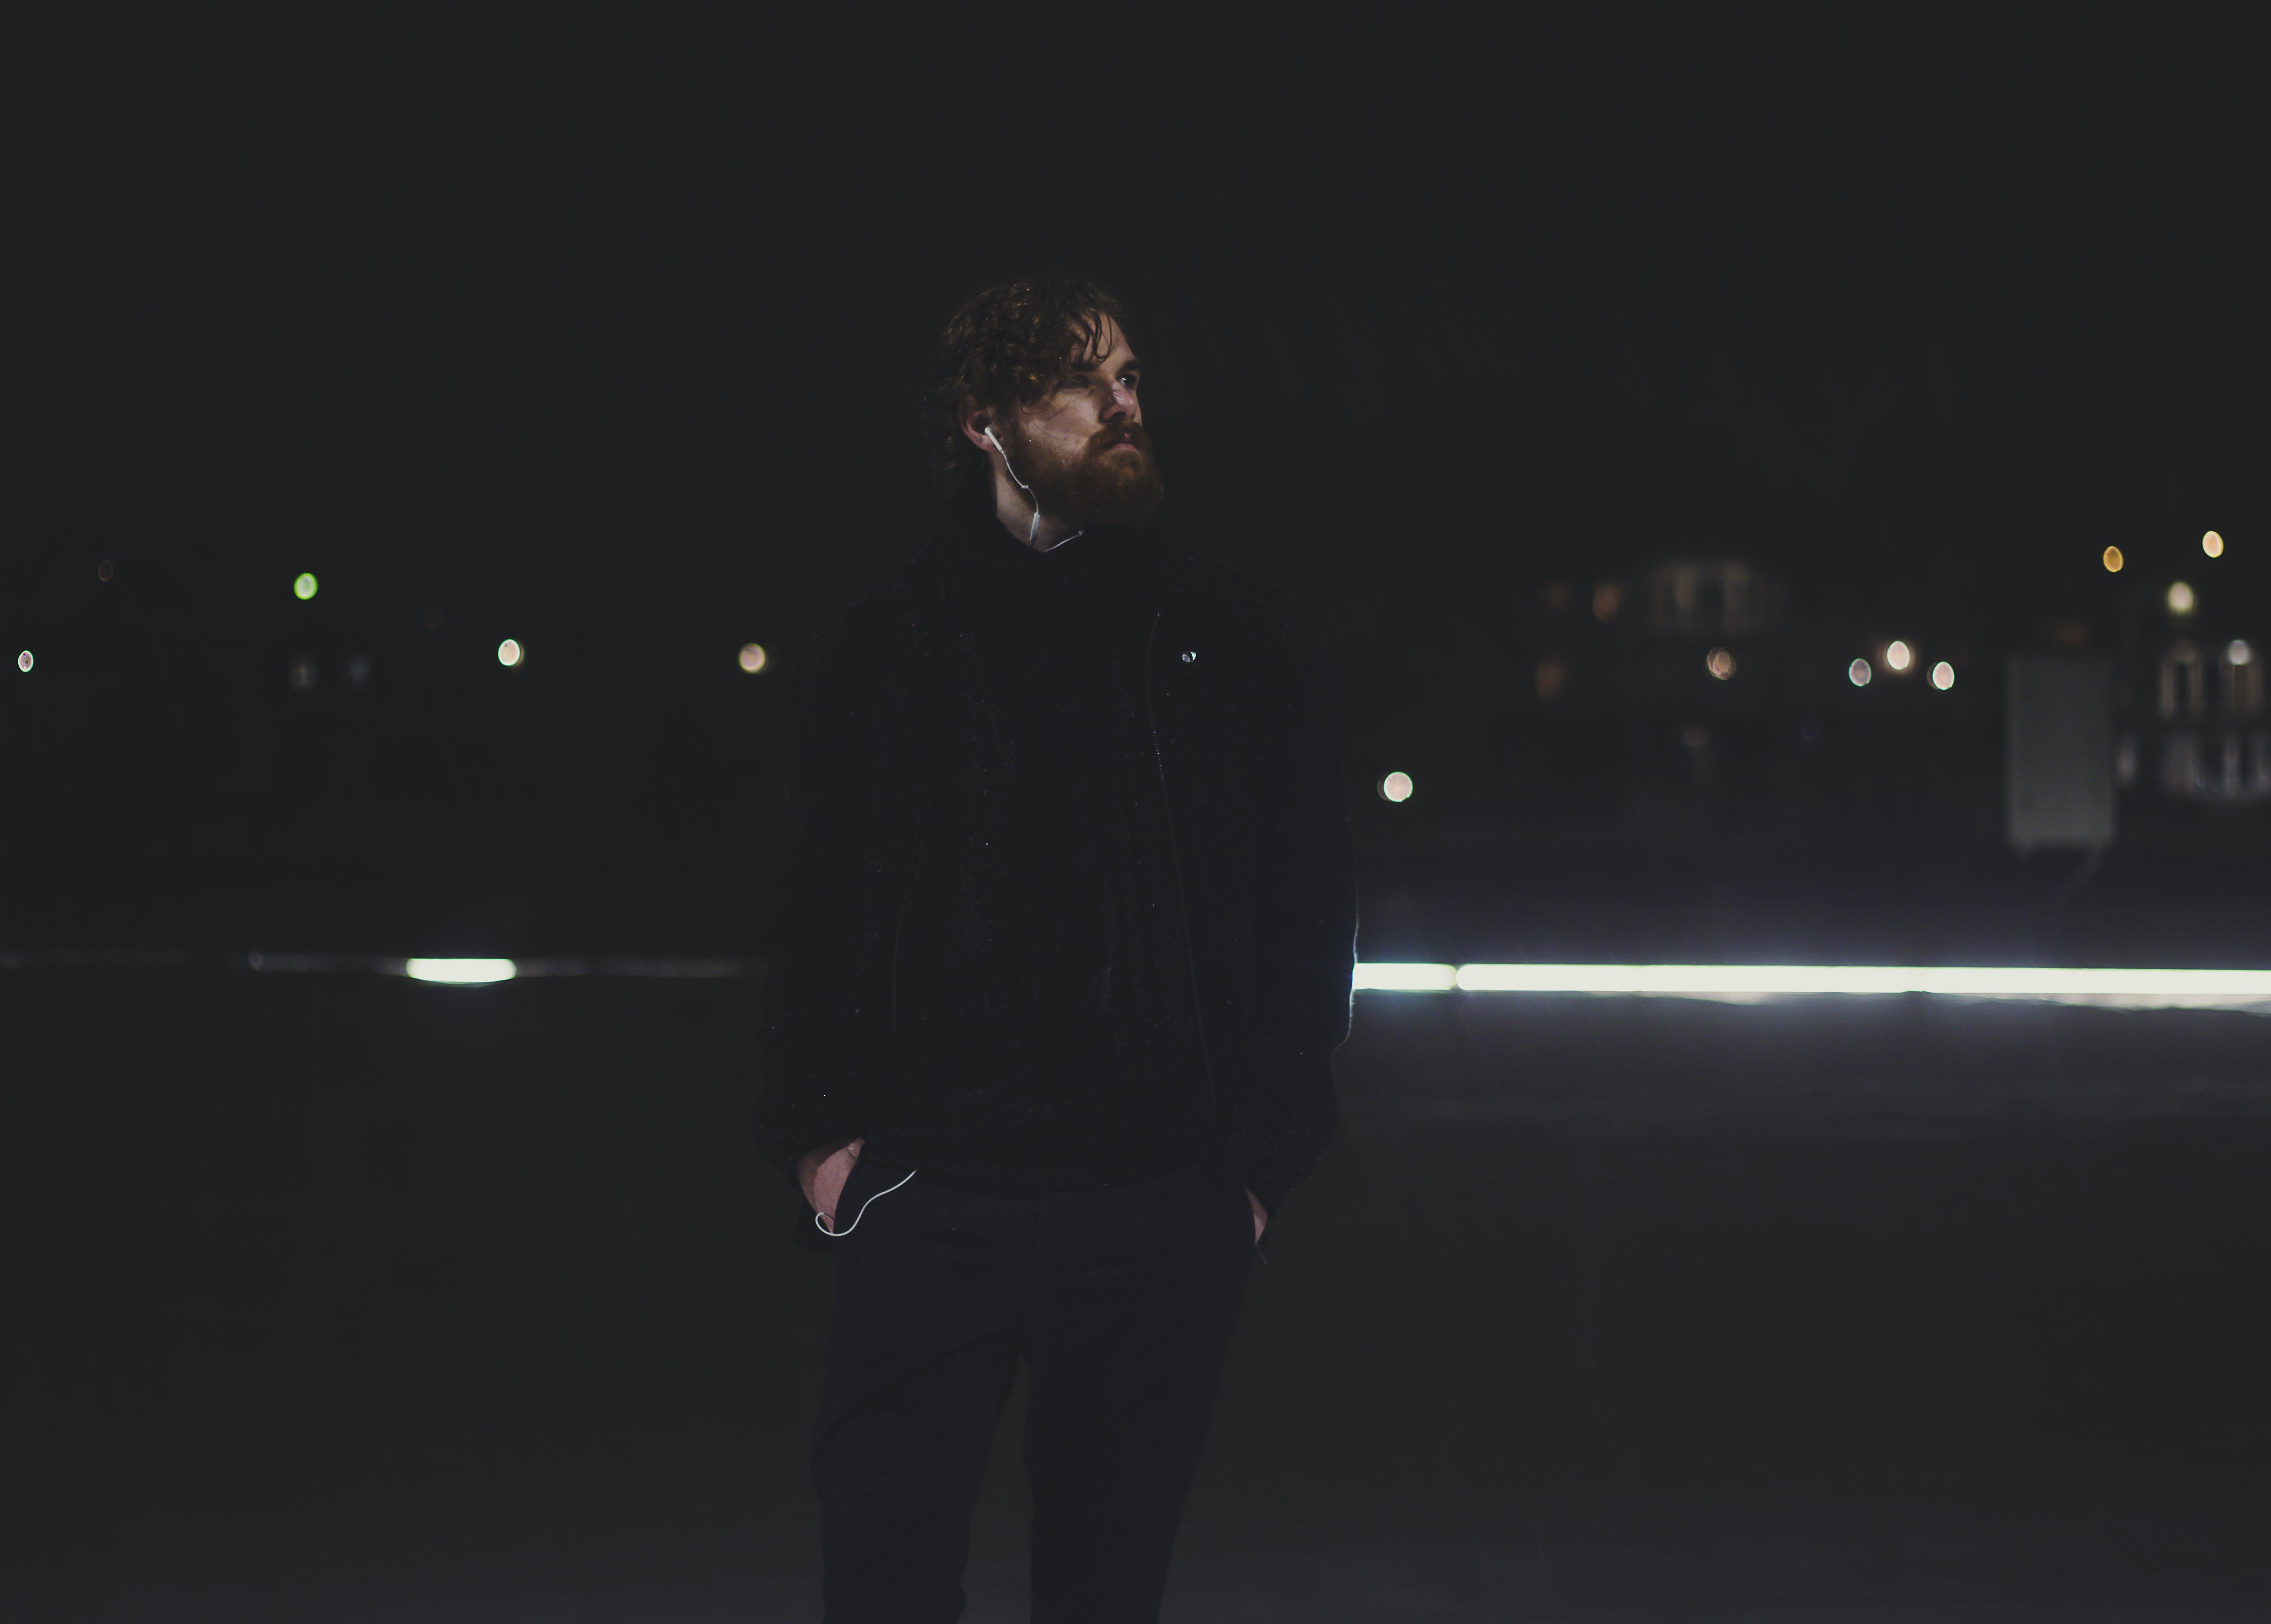 Man Wearing Jacket and Pants